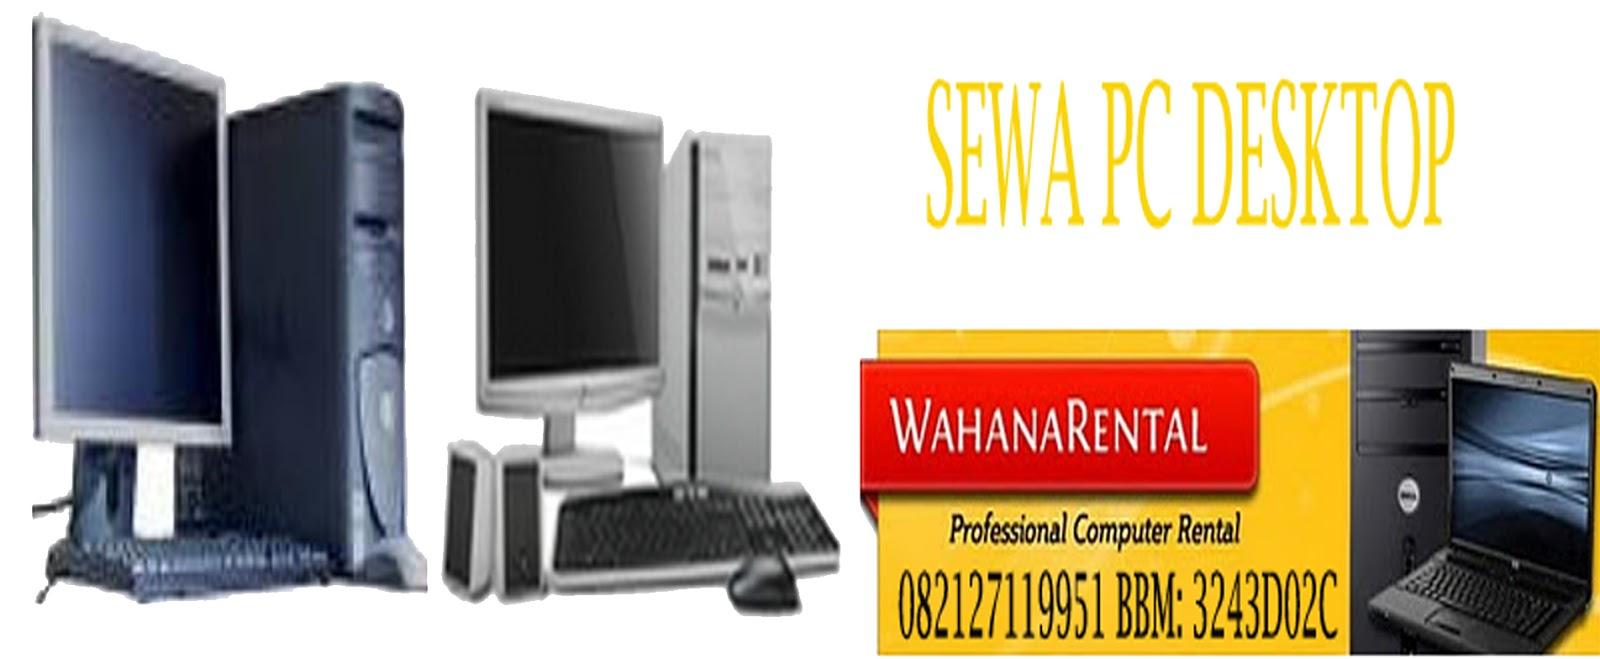 sewa komputer, rental komputer, sewa pc, rental pc desktop